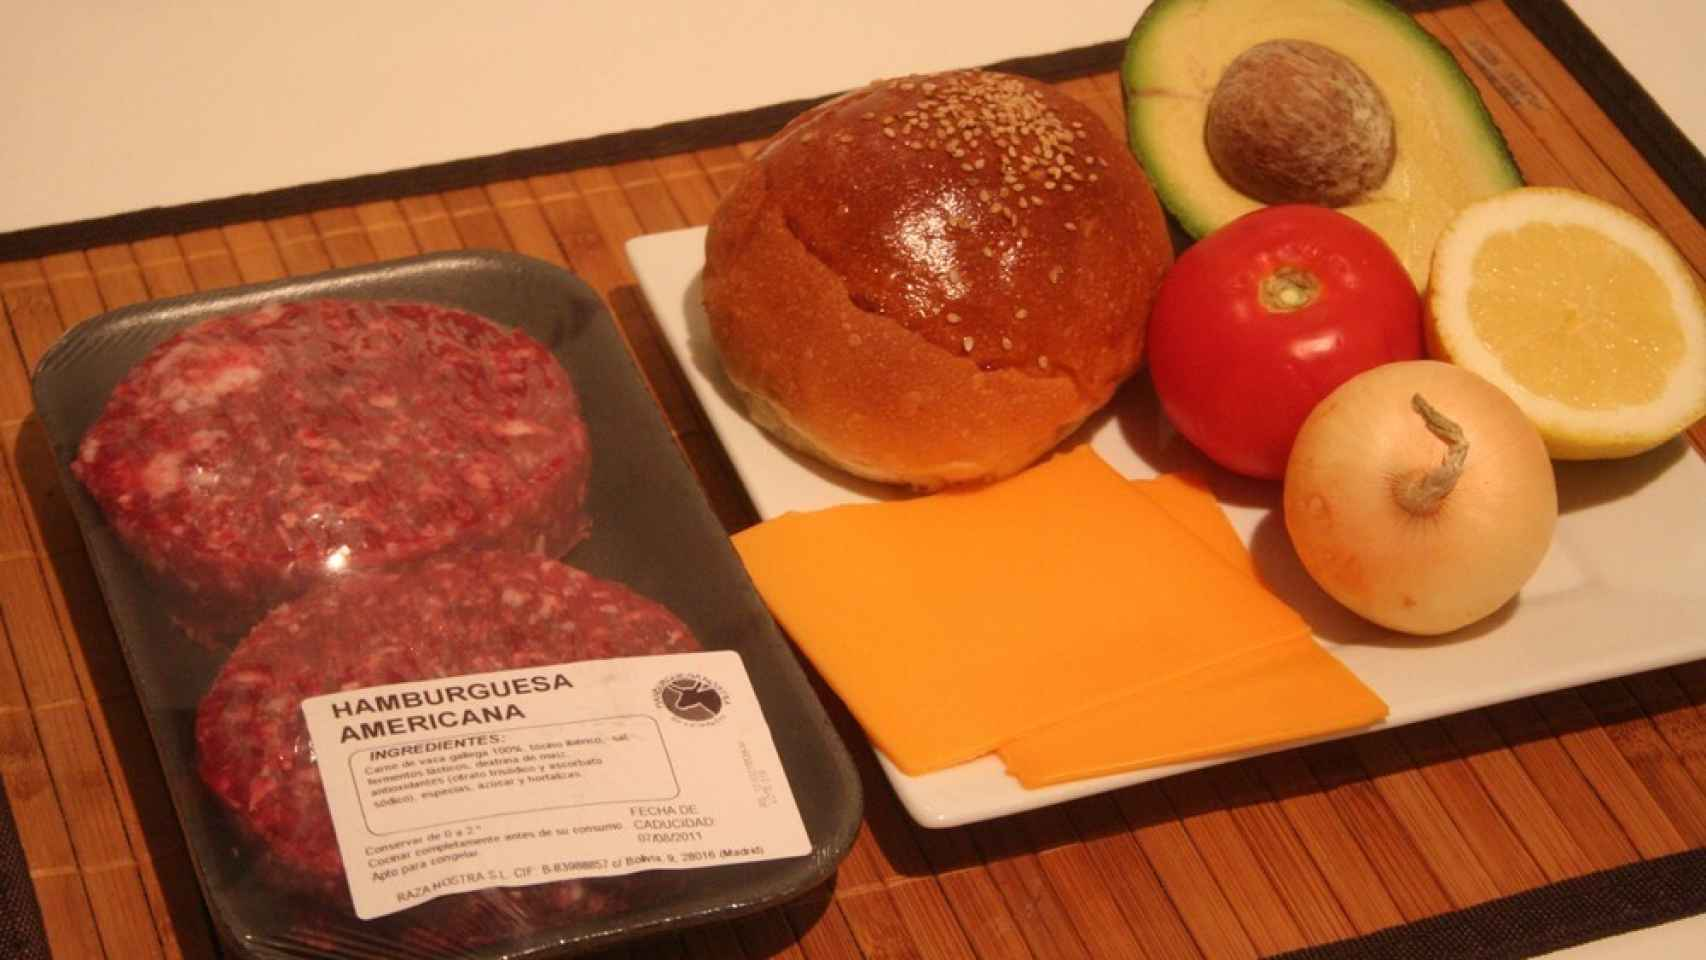 Hamburguesa_Gourmet_Mexicana_01